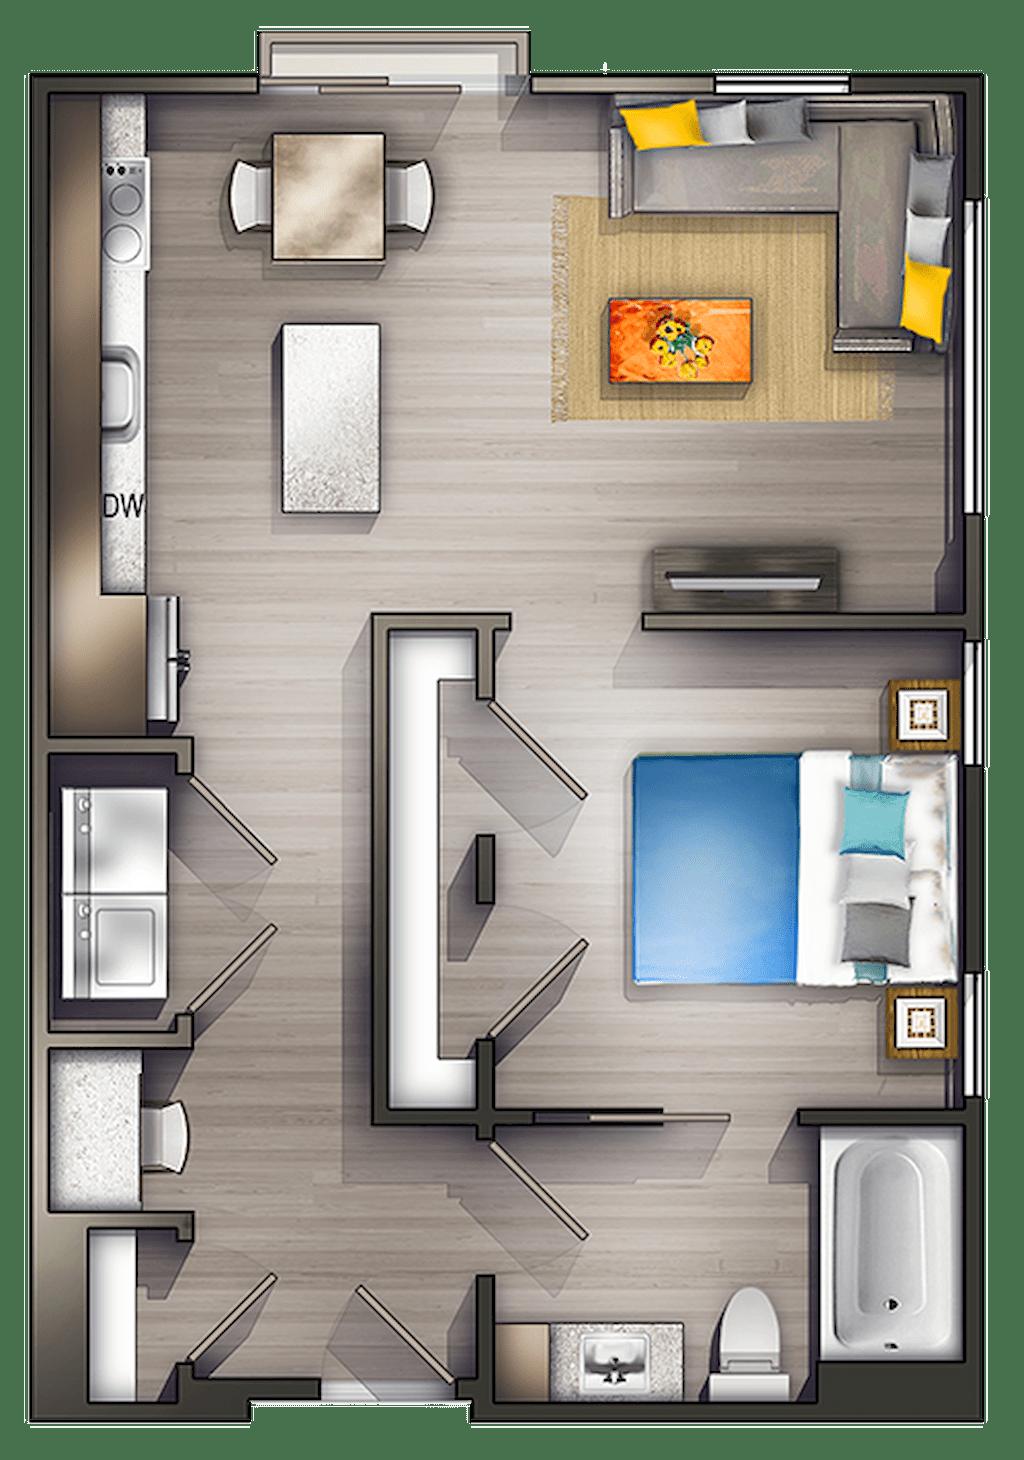 Small Studio Apartment Layout Design Ideas 5 Home Design